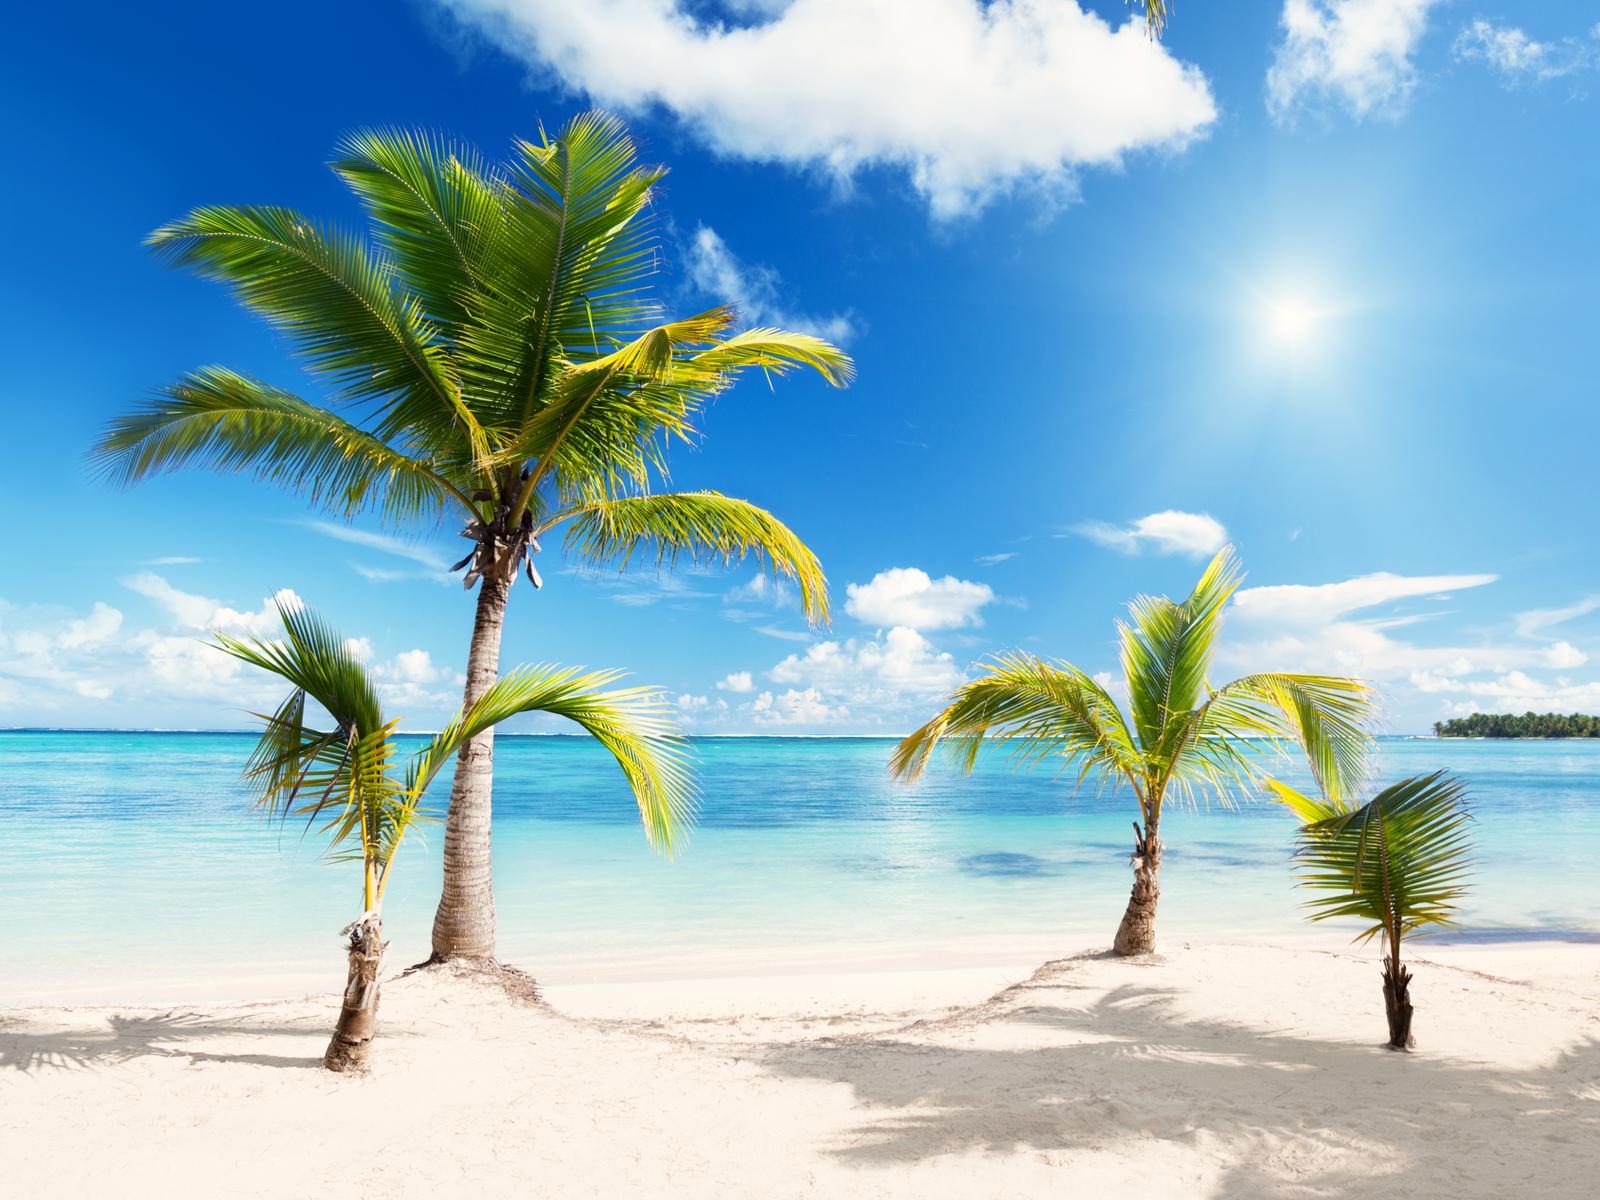 Beach PNG Transparent Images.